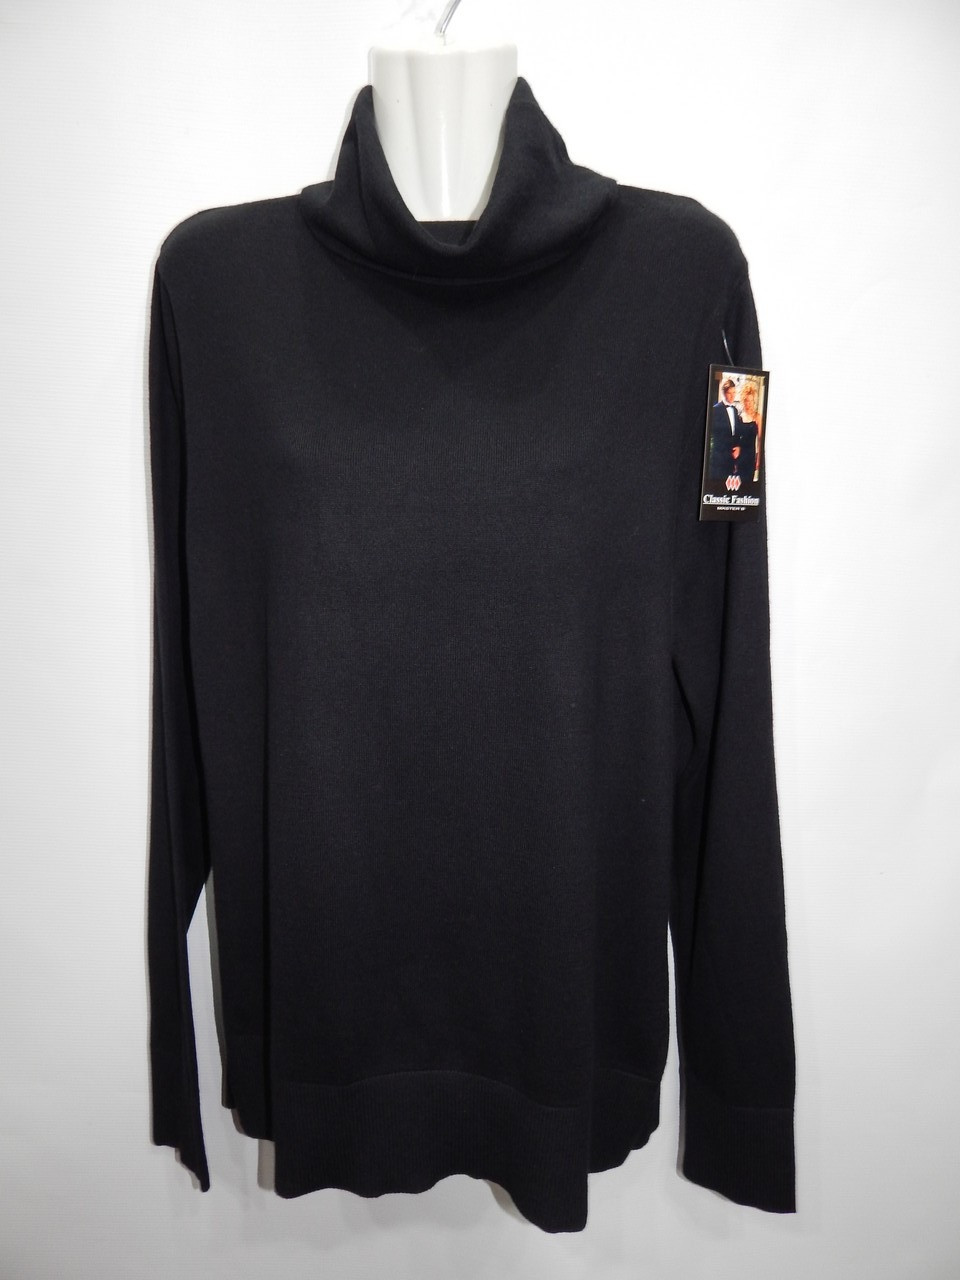 Гольф-трикотажний светр жіночий Mossimo RUS 52-54 EUR 44-46 075GQ